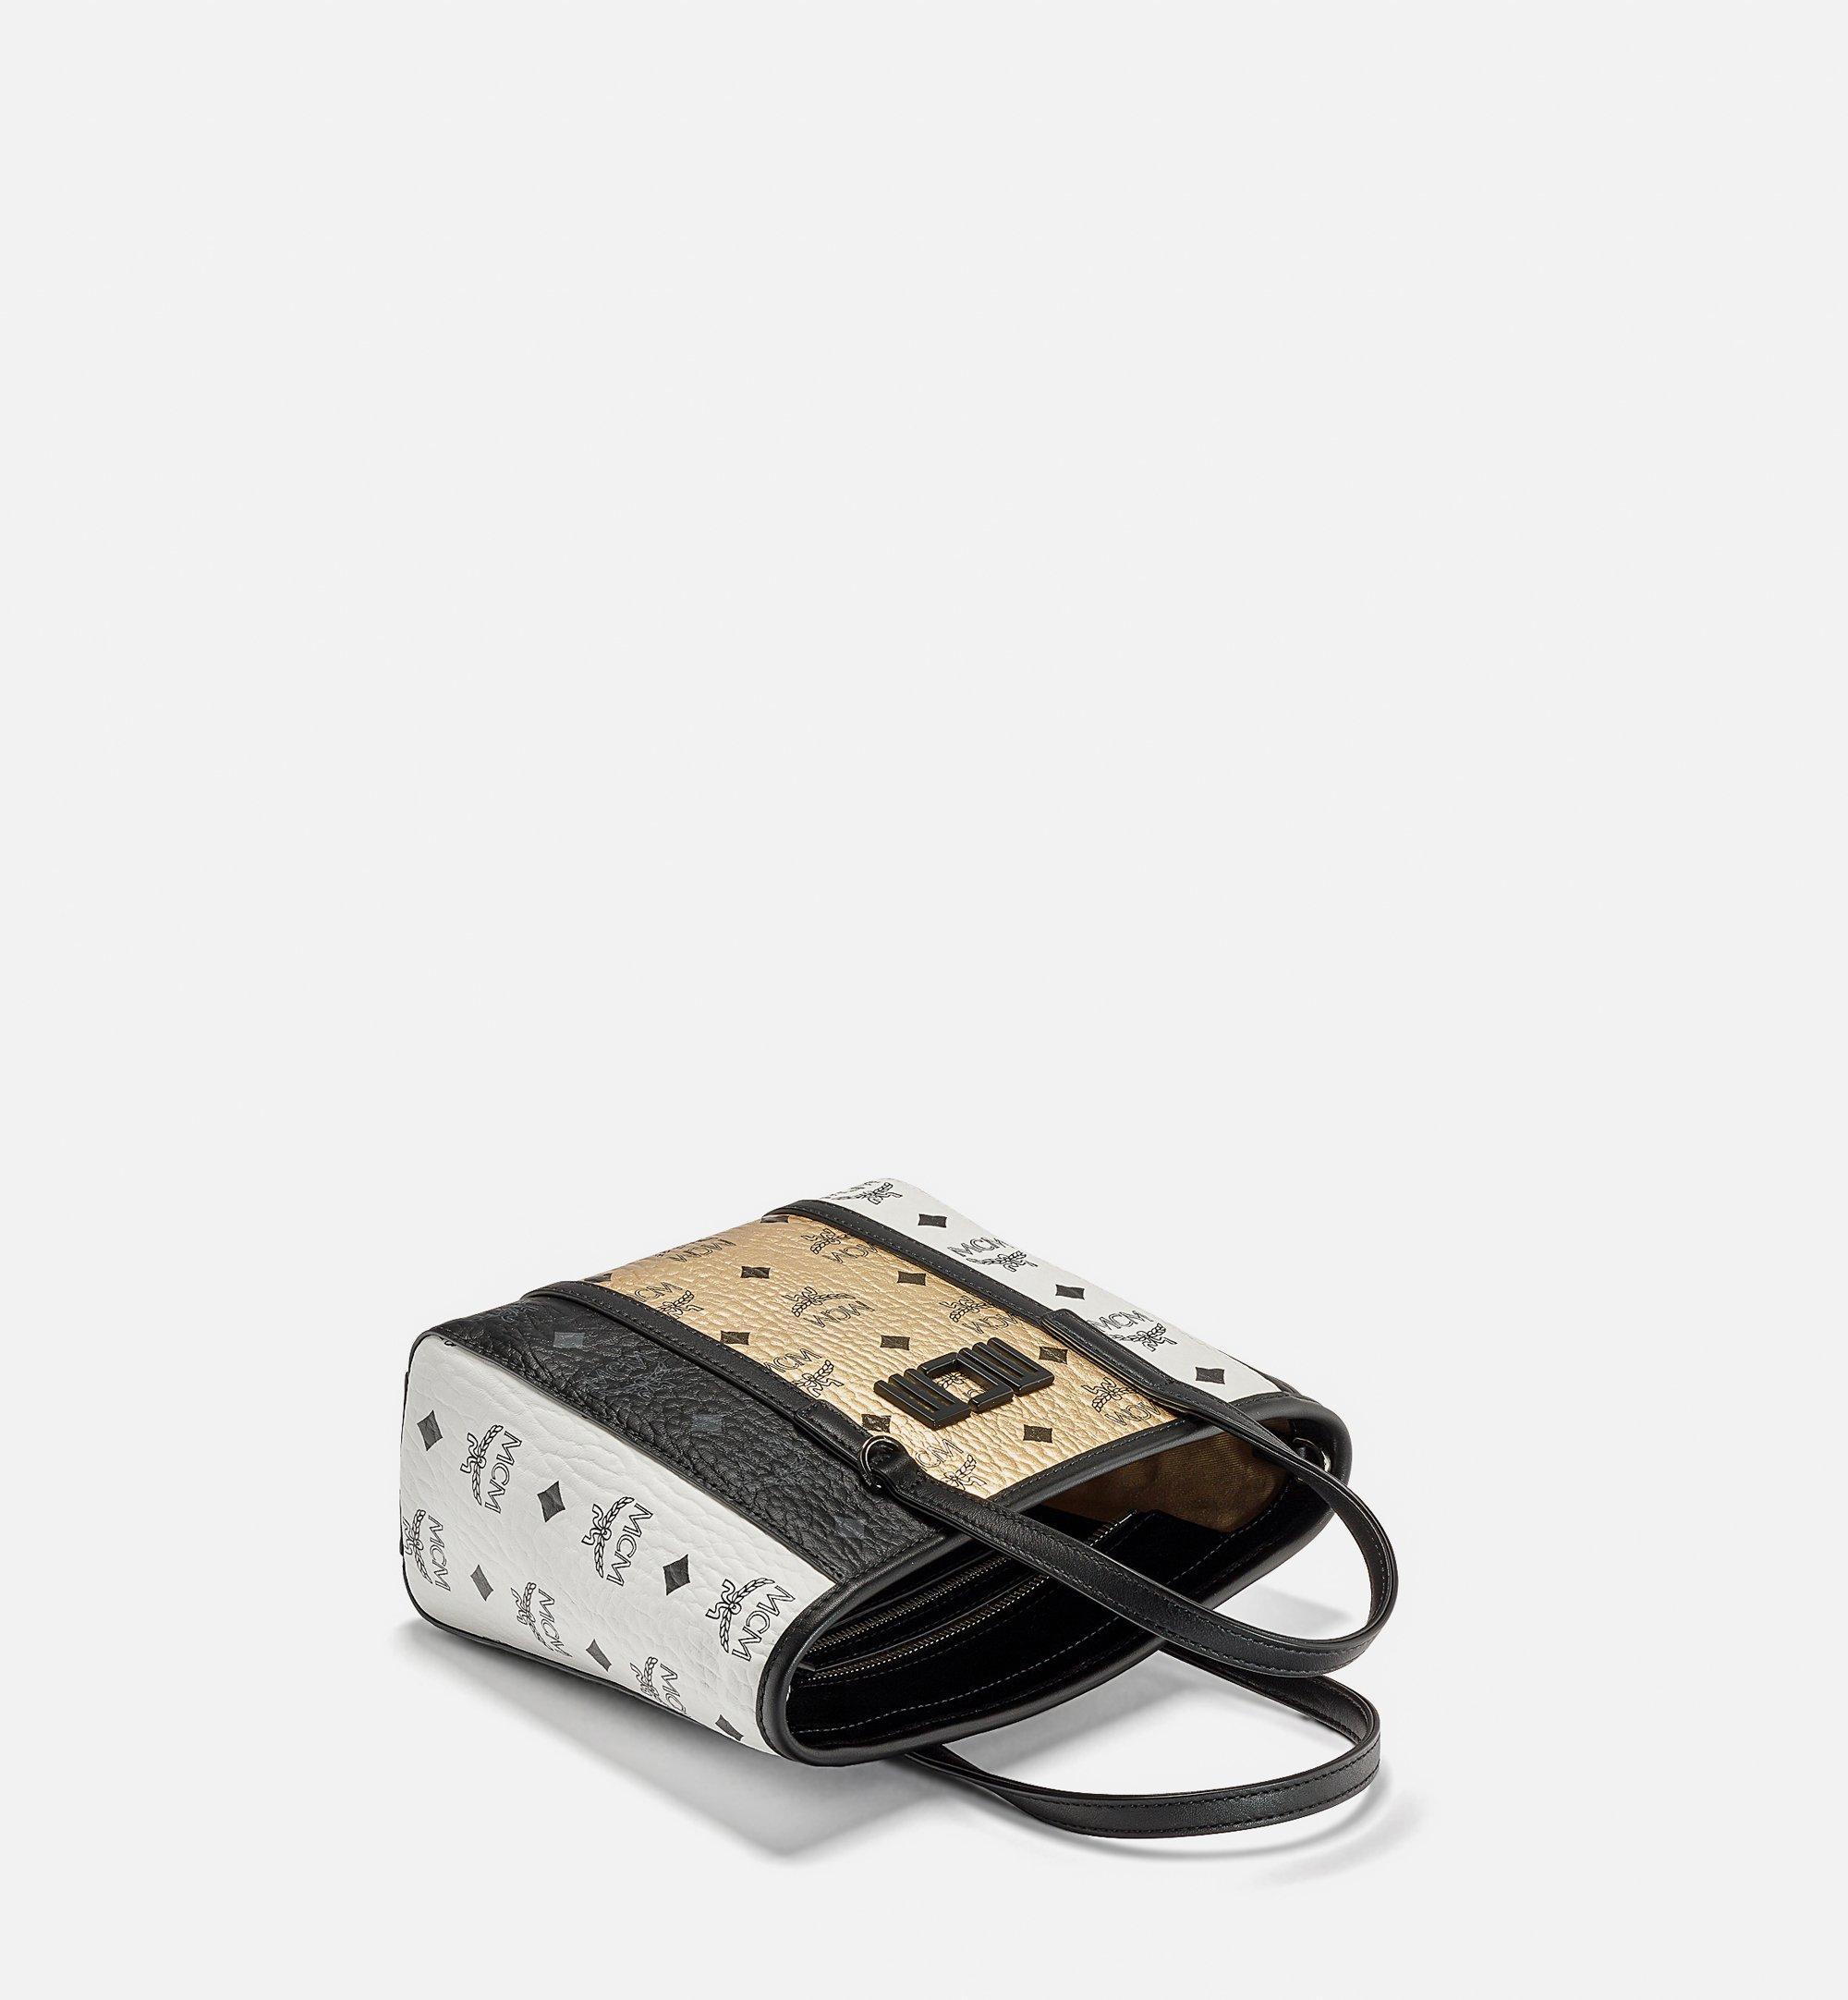 MCM Toni Visetos拼接购物袋 Gold MWPBSTN02T1001 更多视角 2